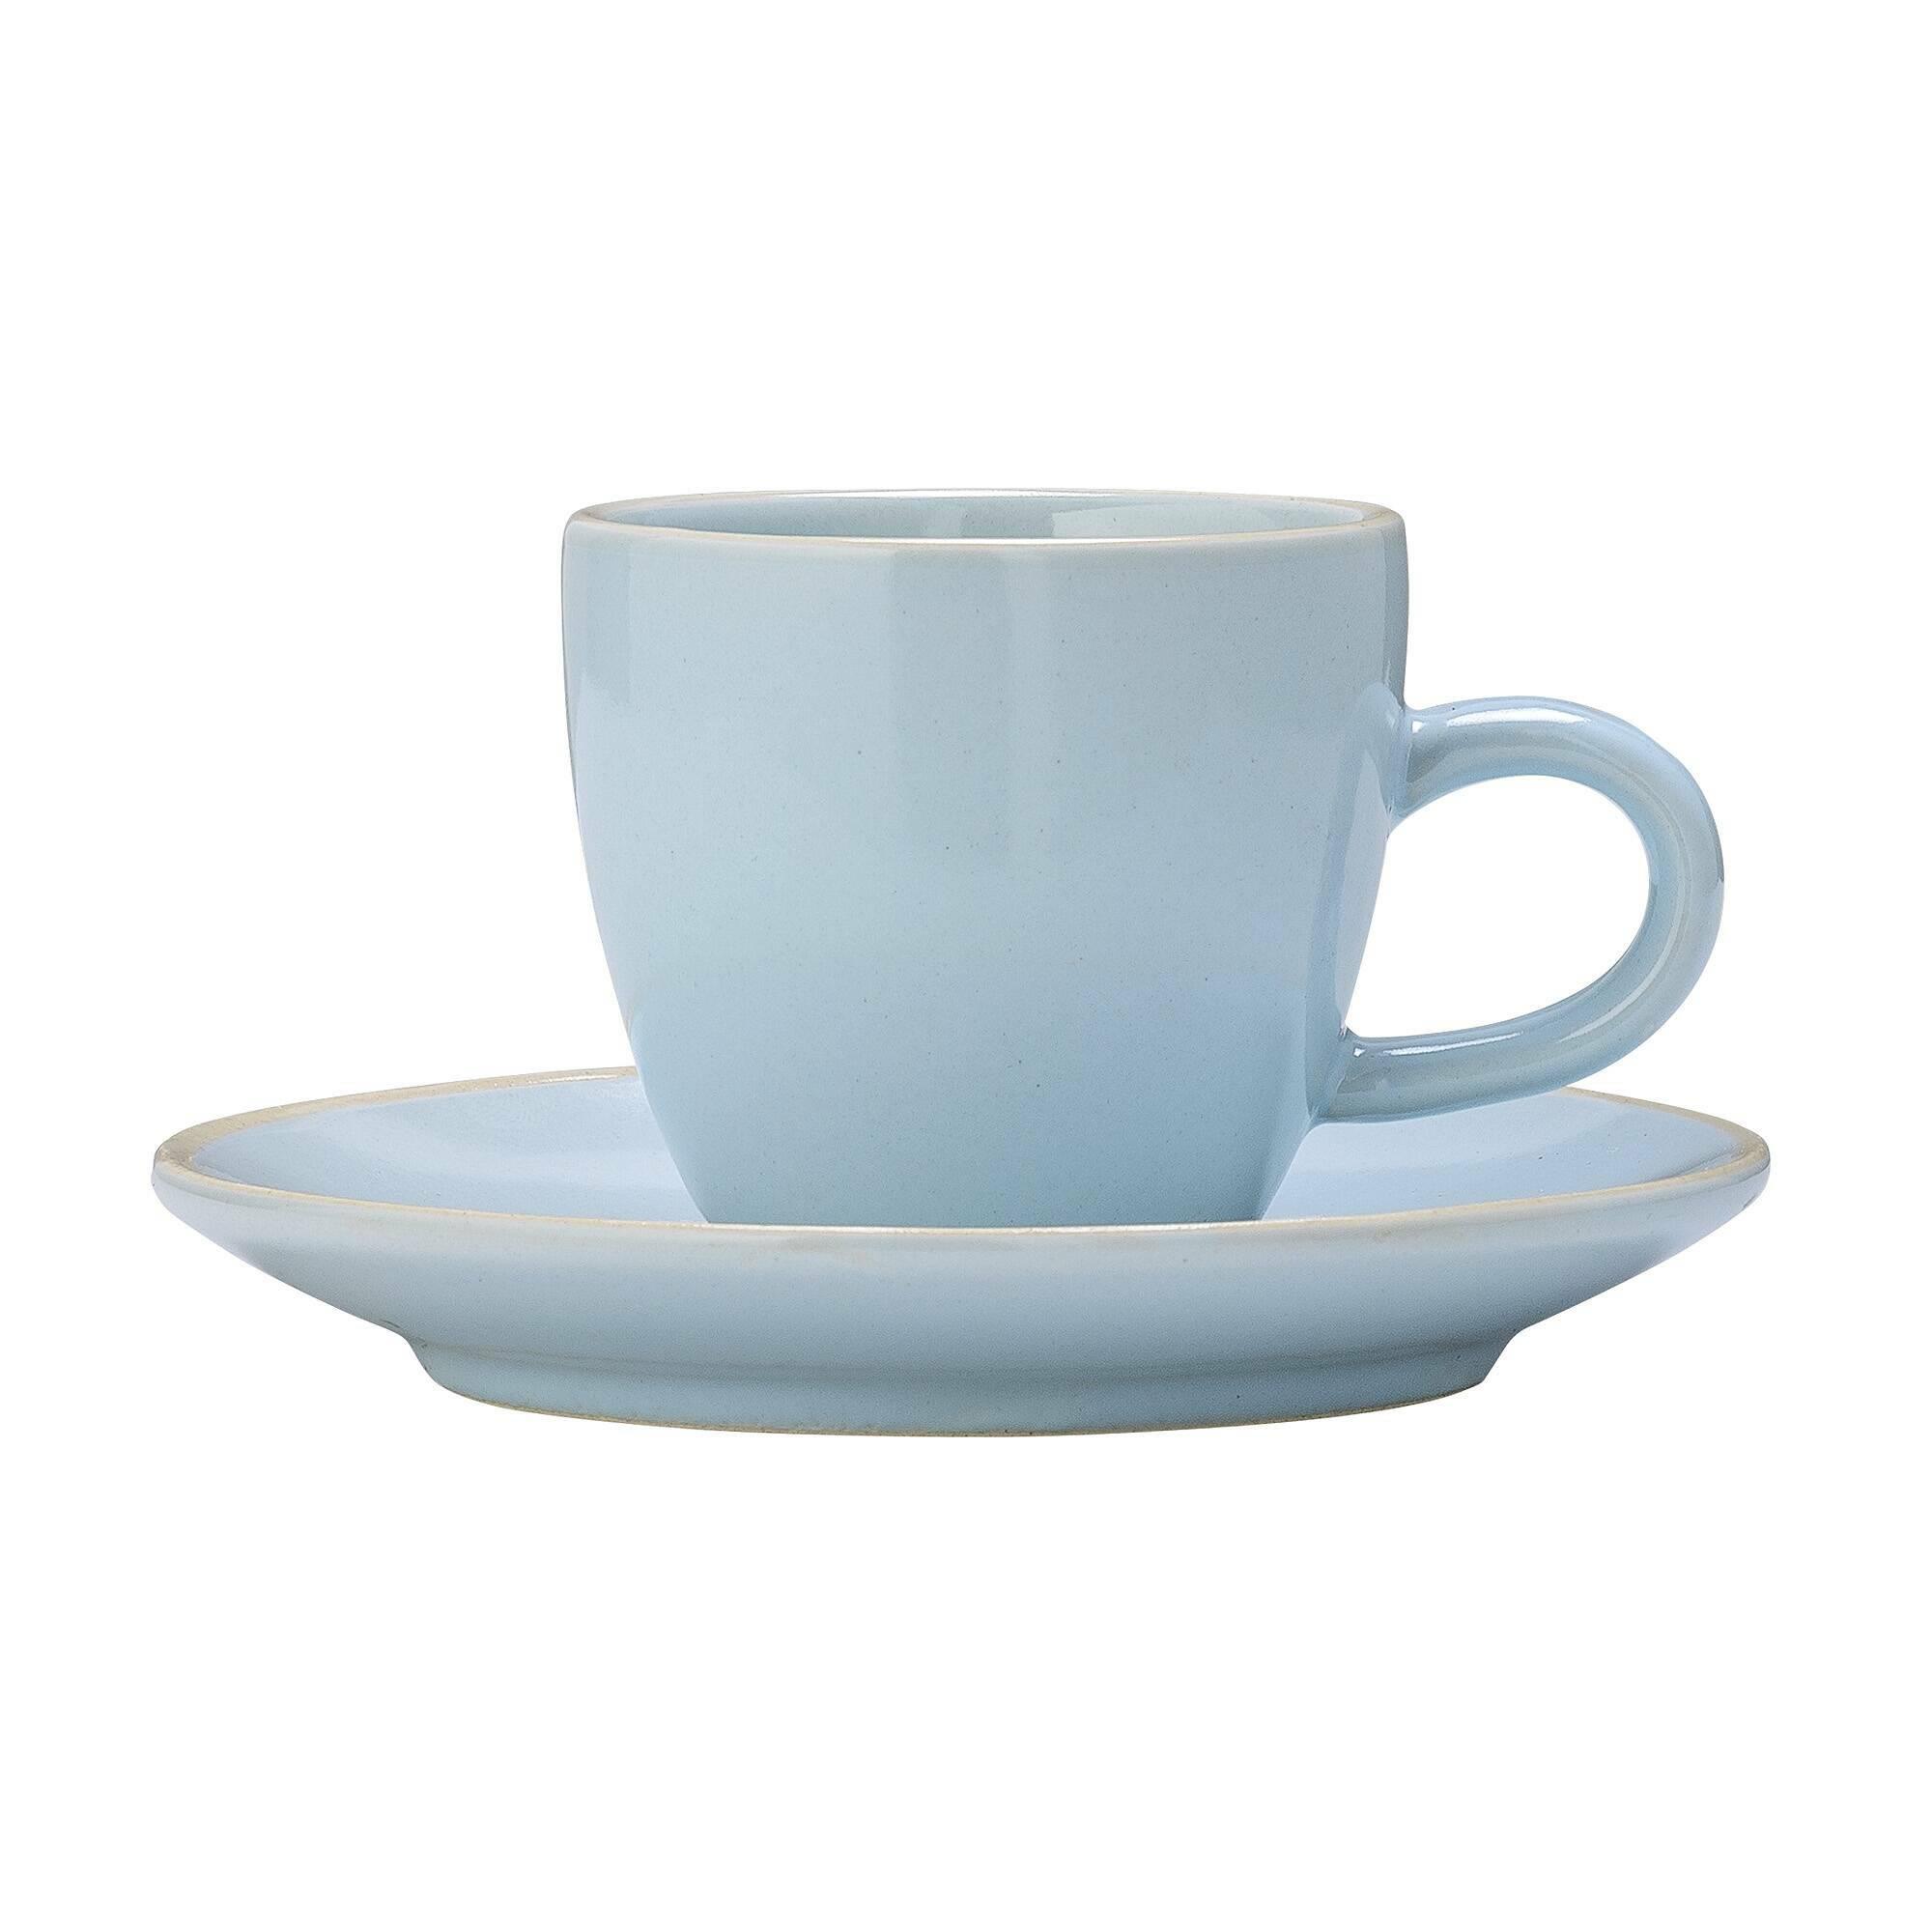 Чашка с блюдцем Bloomingville голубаяПосуда<br><br><br>stock: 1<br>Высота: 5,5<br>Материал: Керамика<br>Цвет: Голубой<br>Диаметр: 8; 11,5